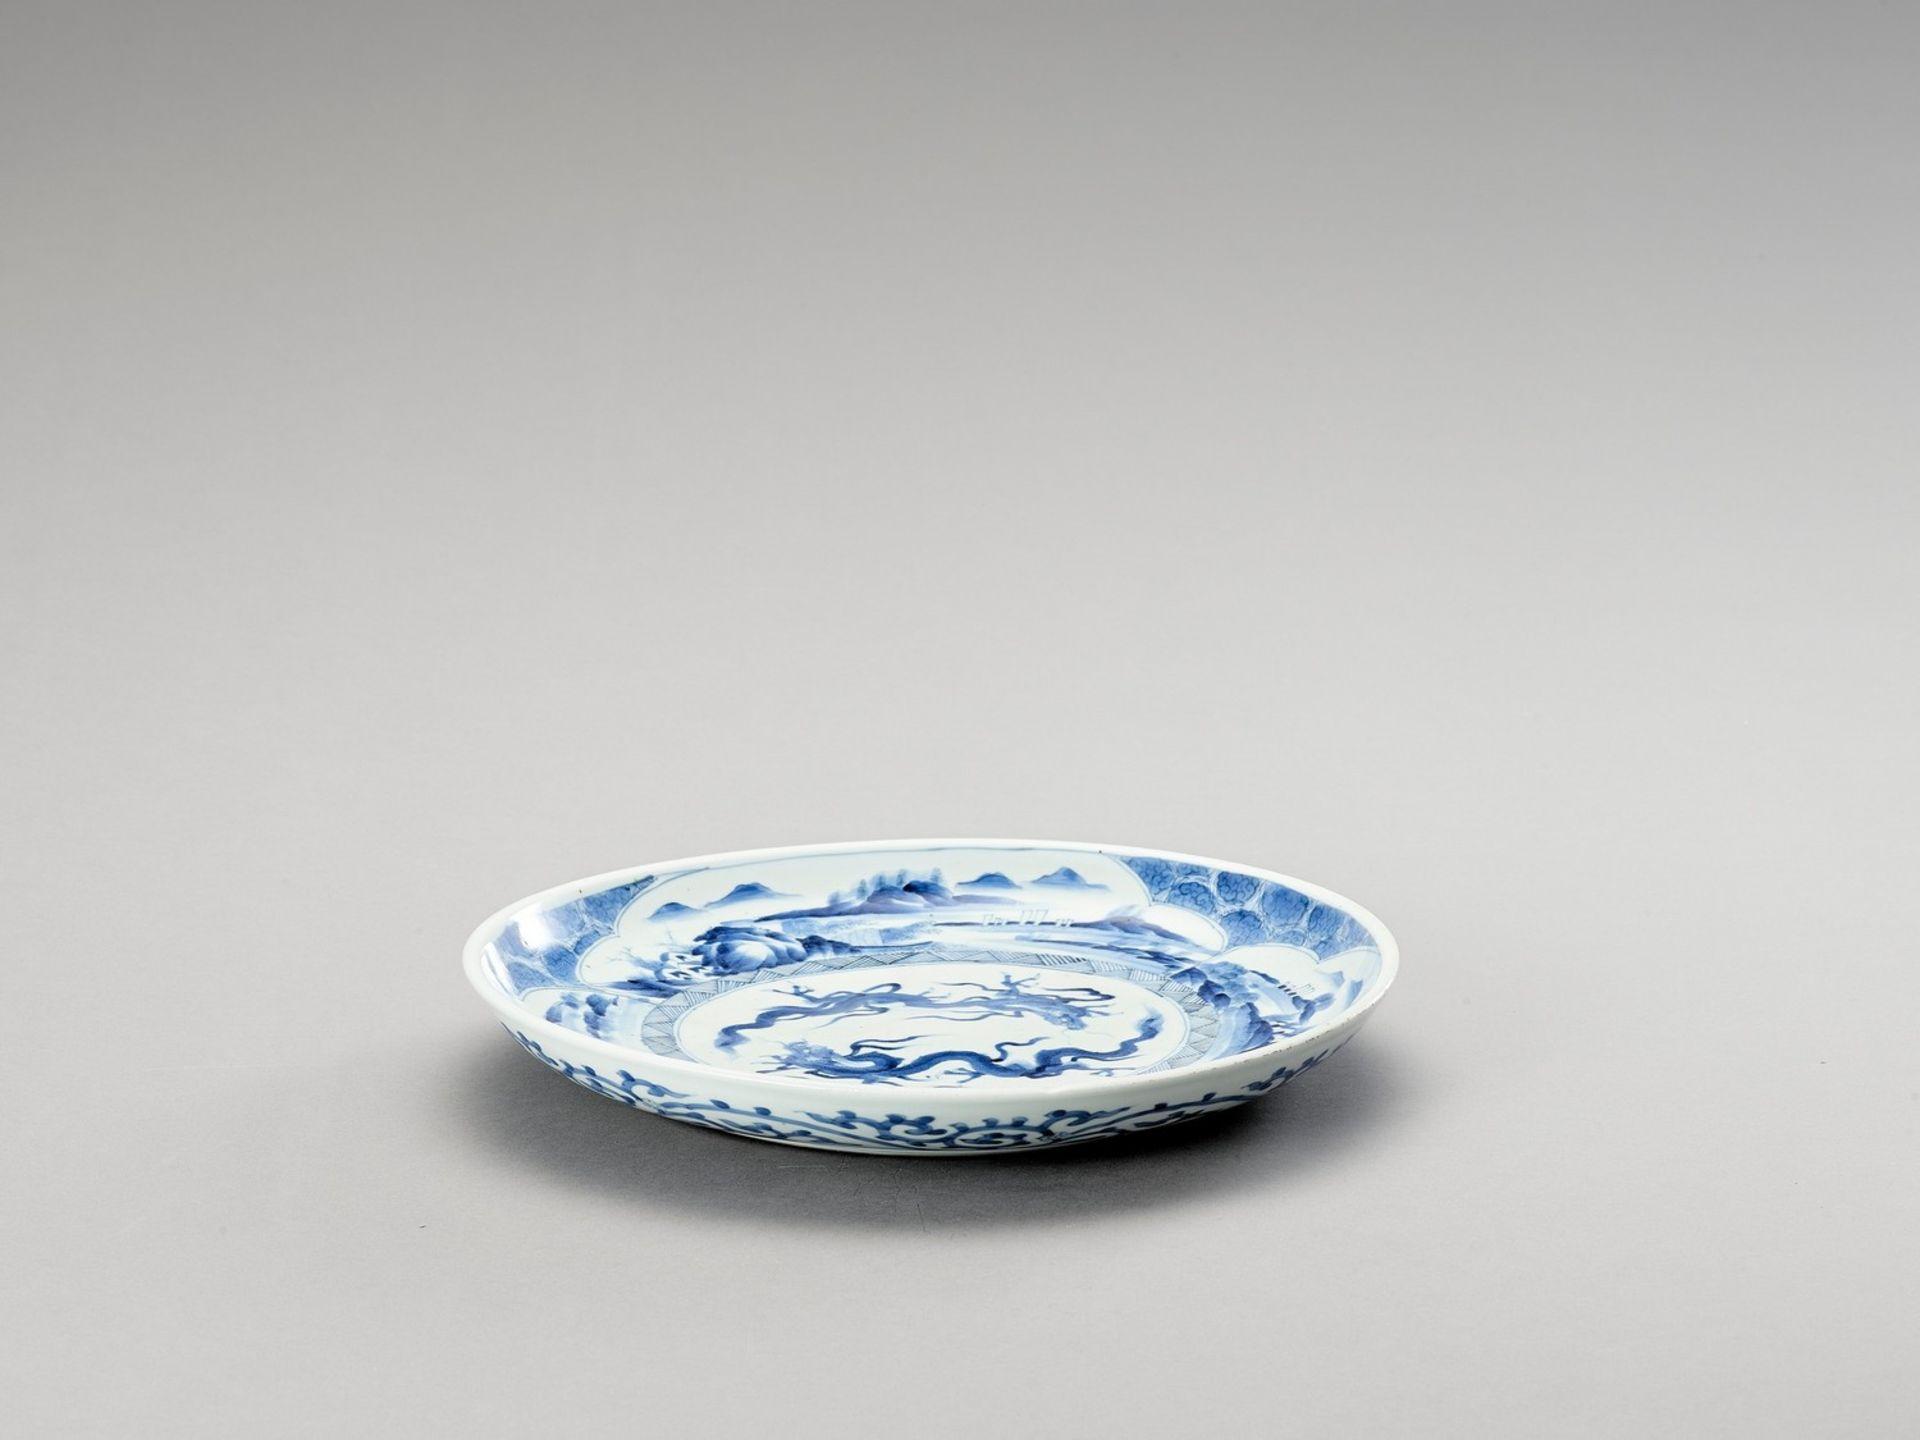 A BLUE AND WHITE PORCELAIN 'DRAGON' PLATE - Bild 2 aus 4